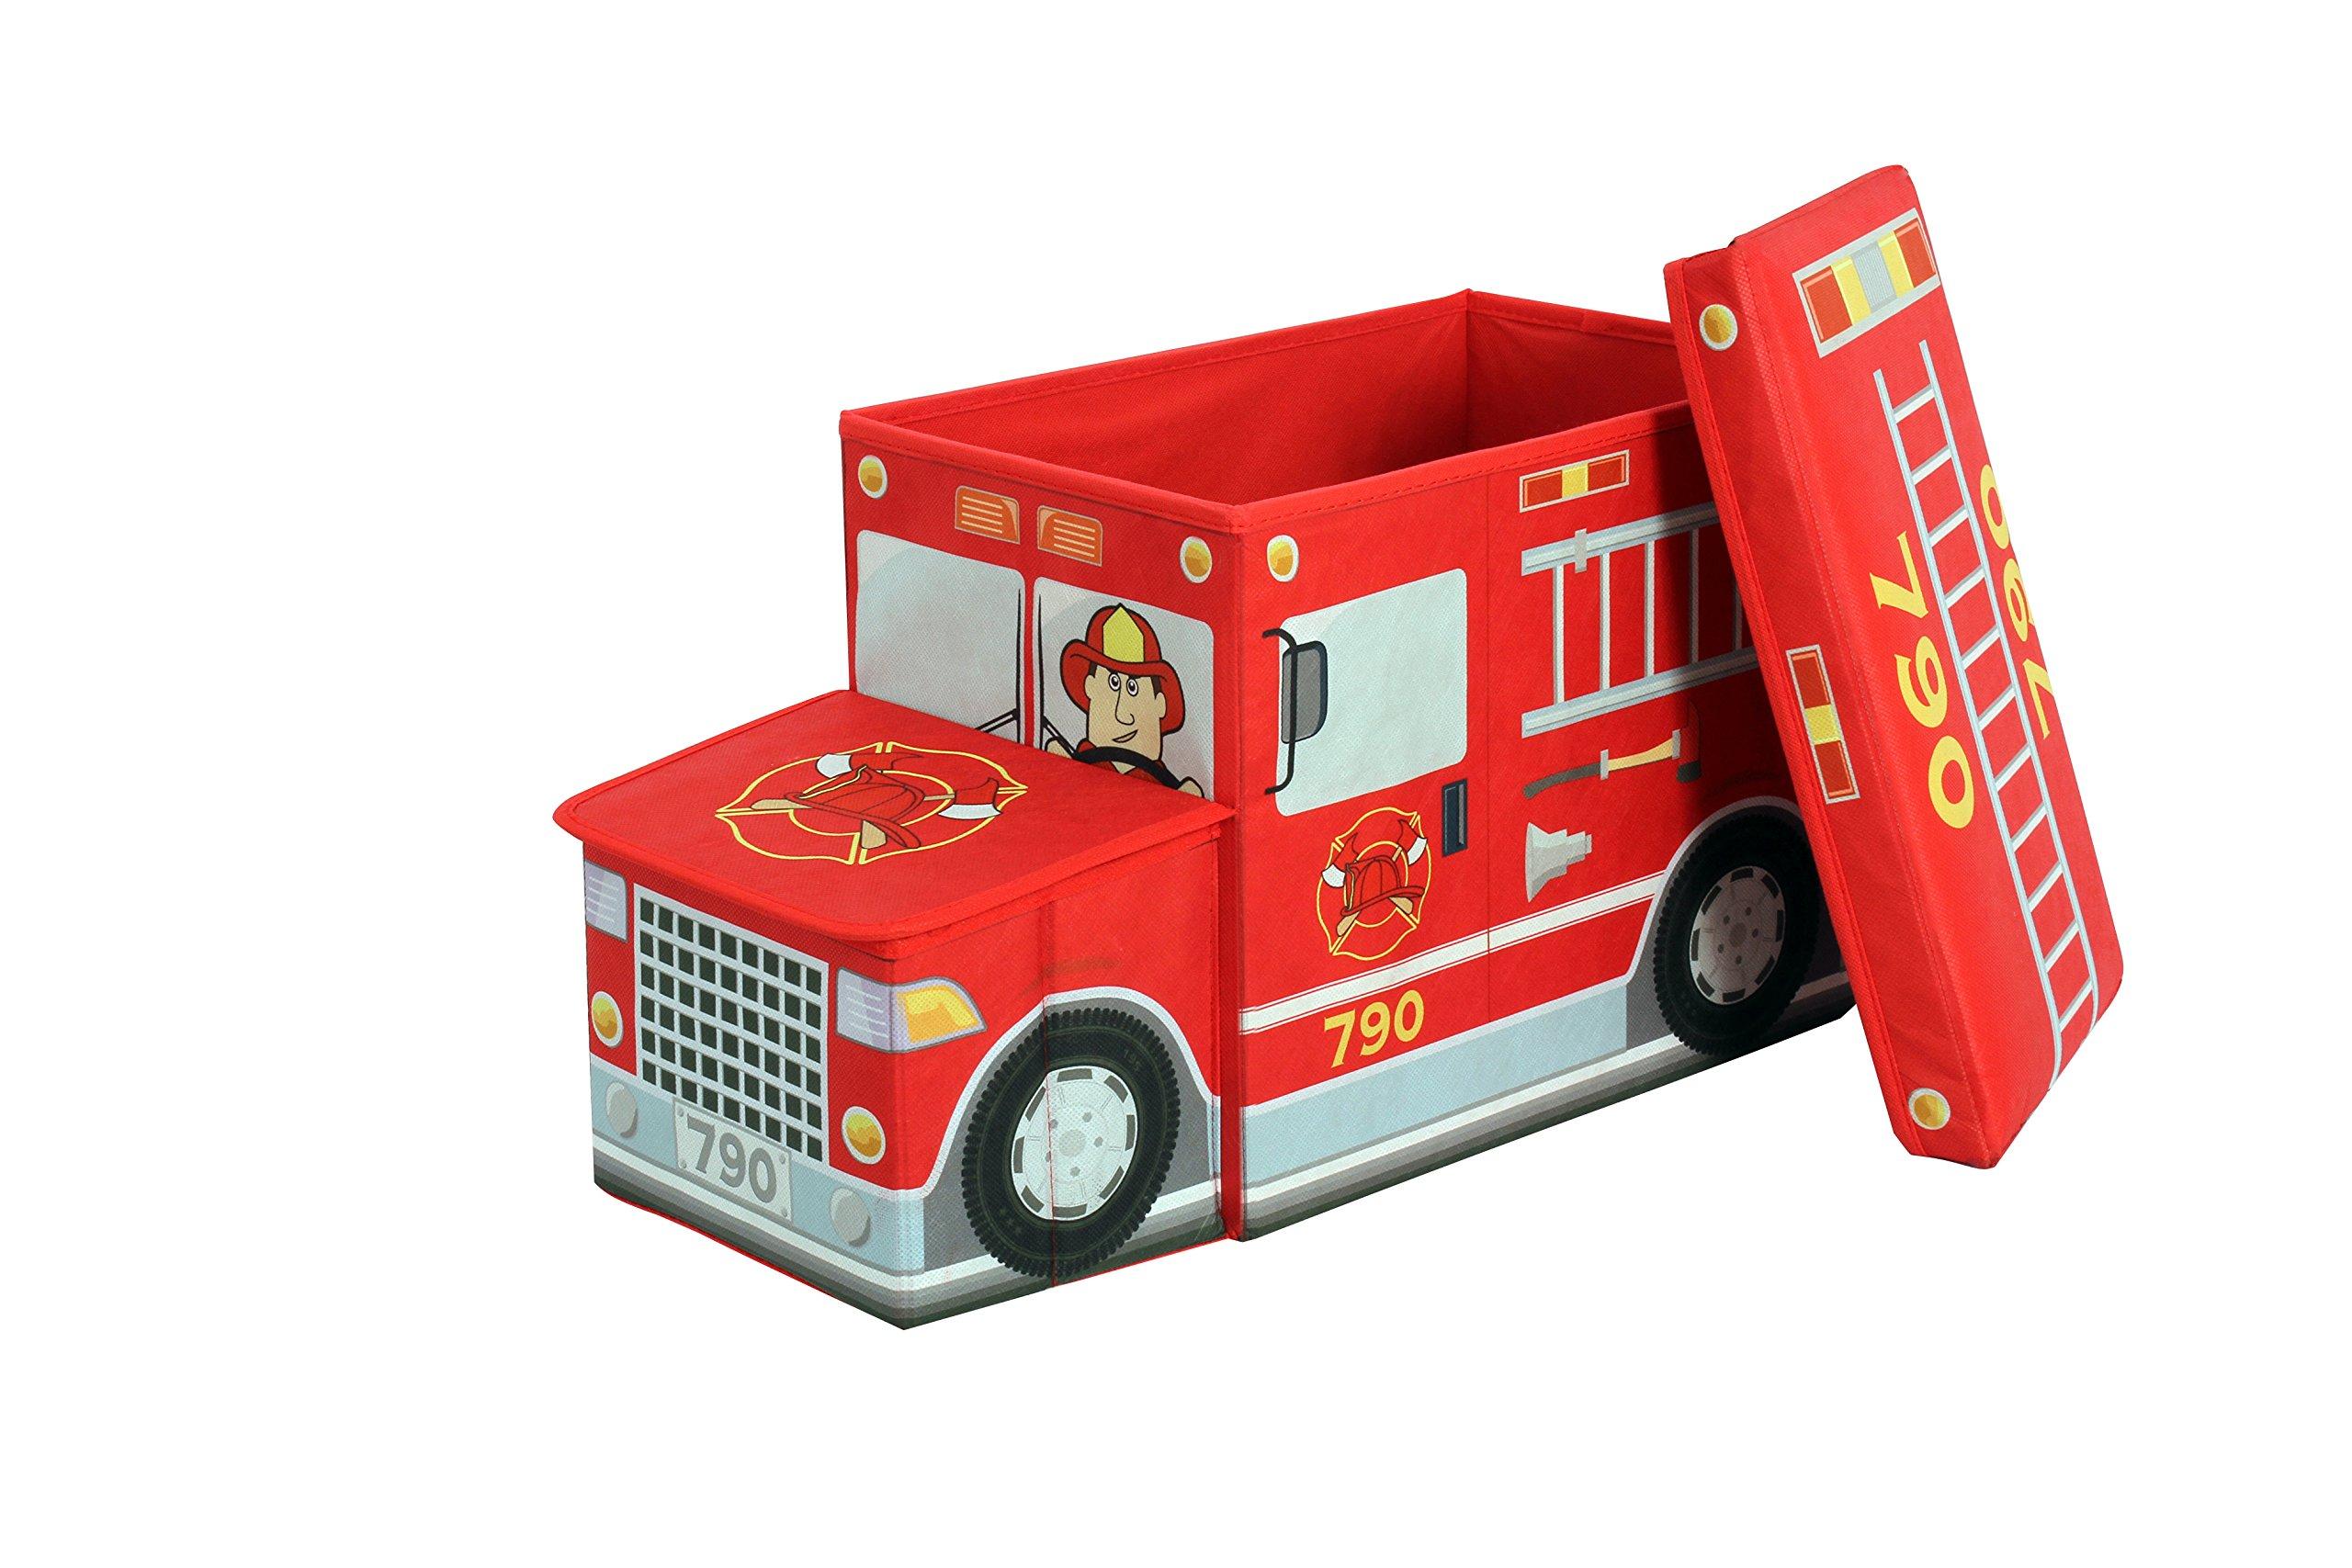 GreenWay Collapsible Fire Truck Children's Storage Ottoman